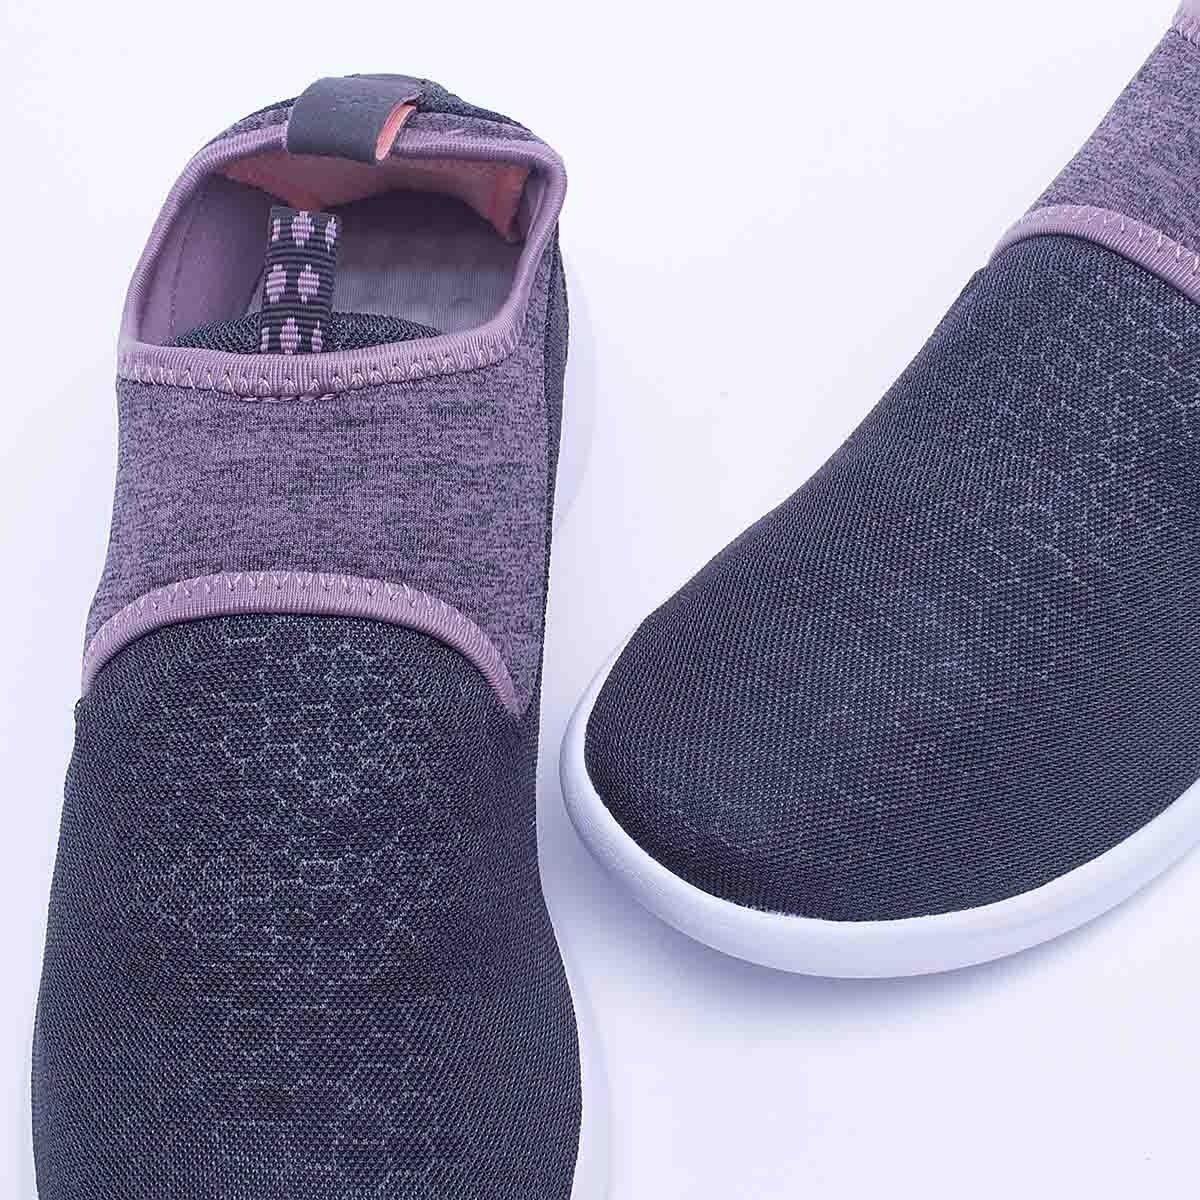 Tênis Reebok Dmx Lite Walk Slip Feminino - Compre Agora  11455b2f899fc